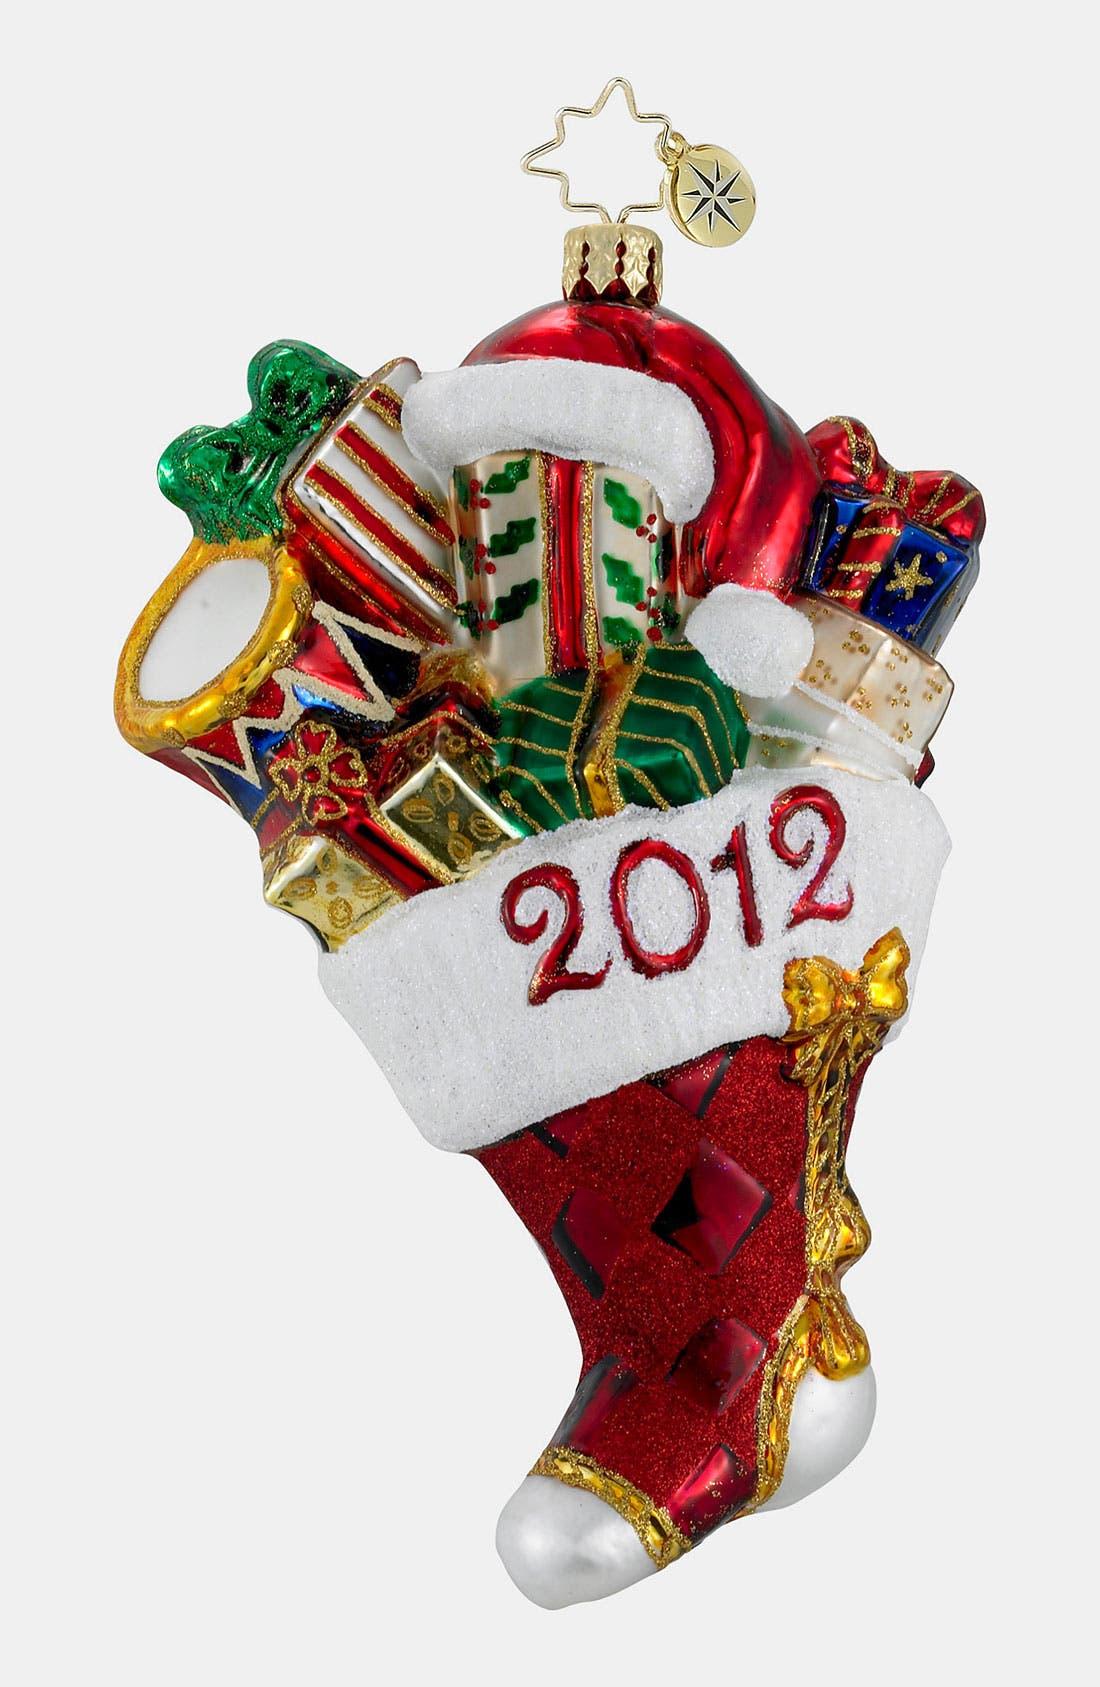 Main Image - Christopher Radko 'Presents-a-Plenty' Ornament